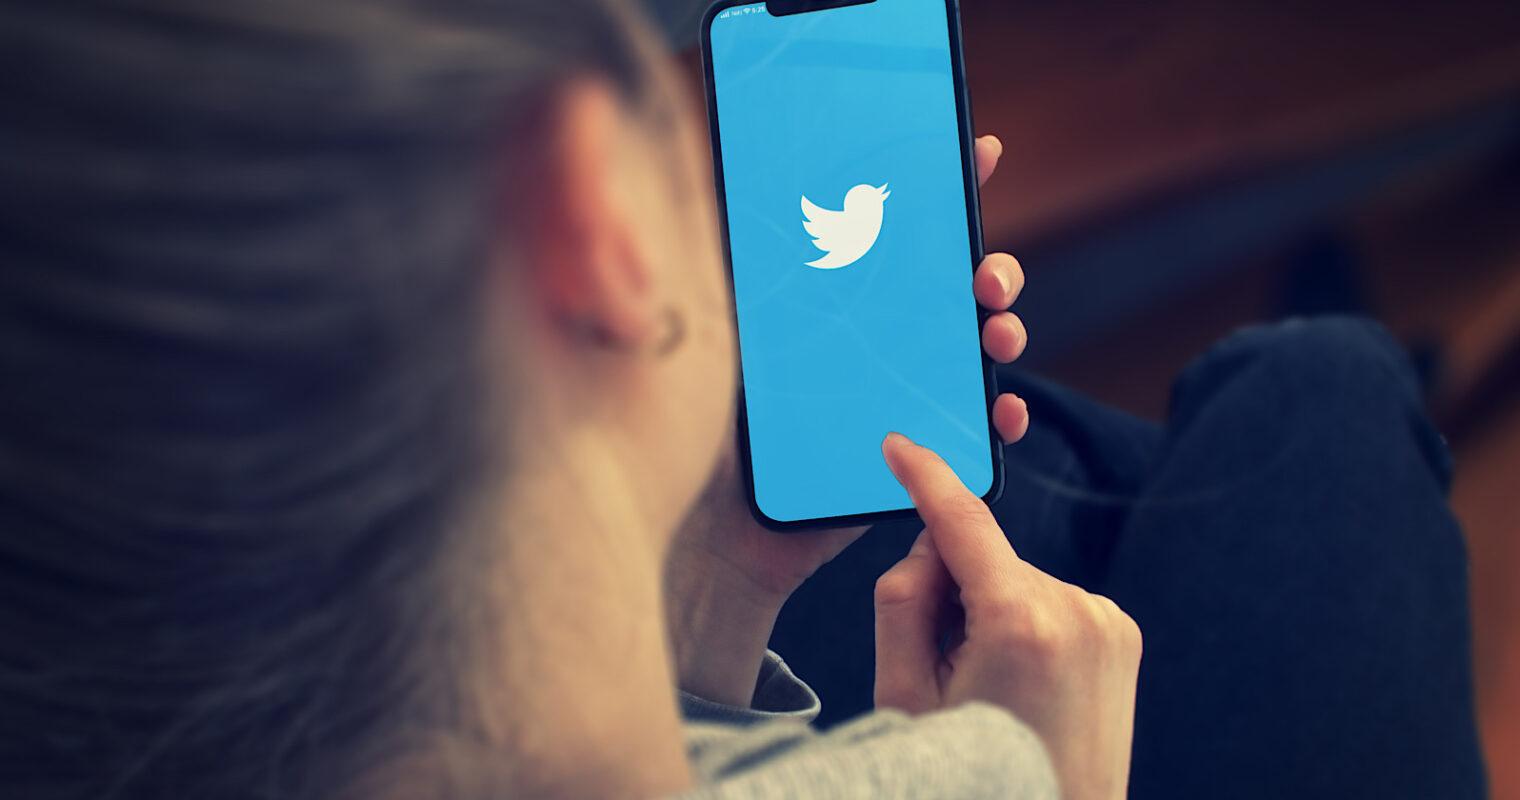 Twitter: Ετοιμάζει νέες συνδρομητικές λειτουργίες